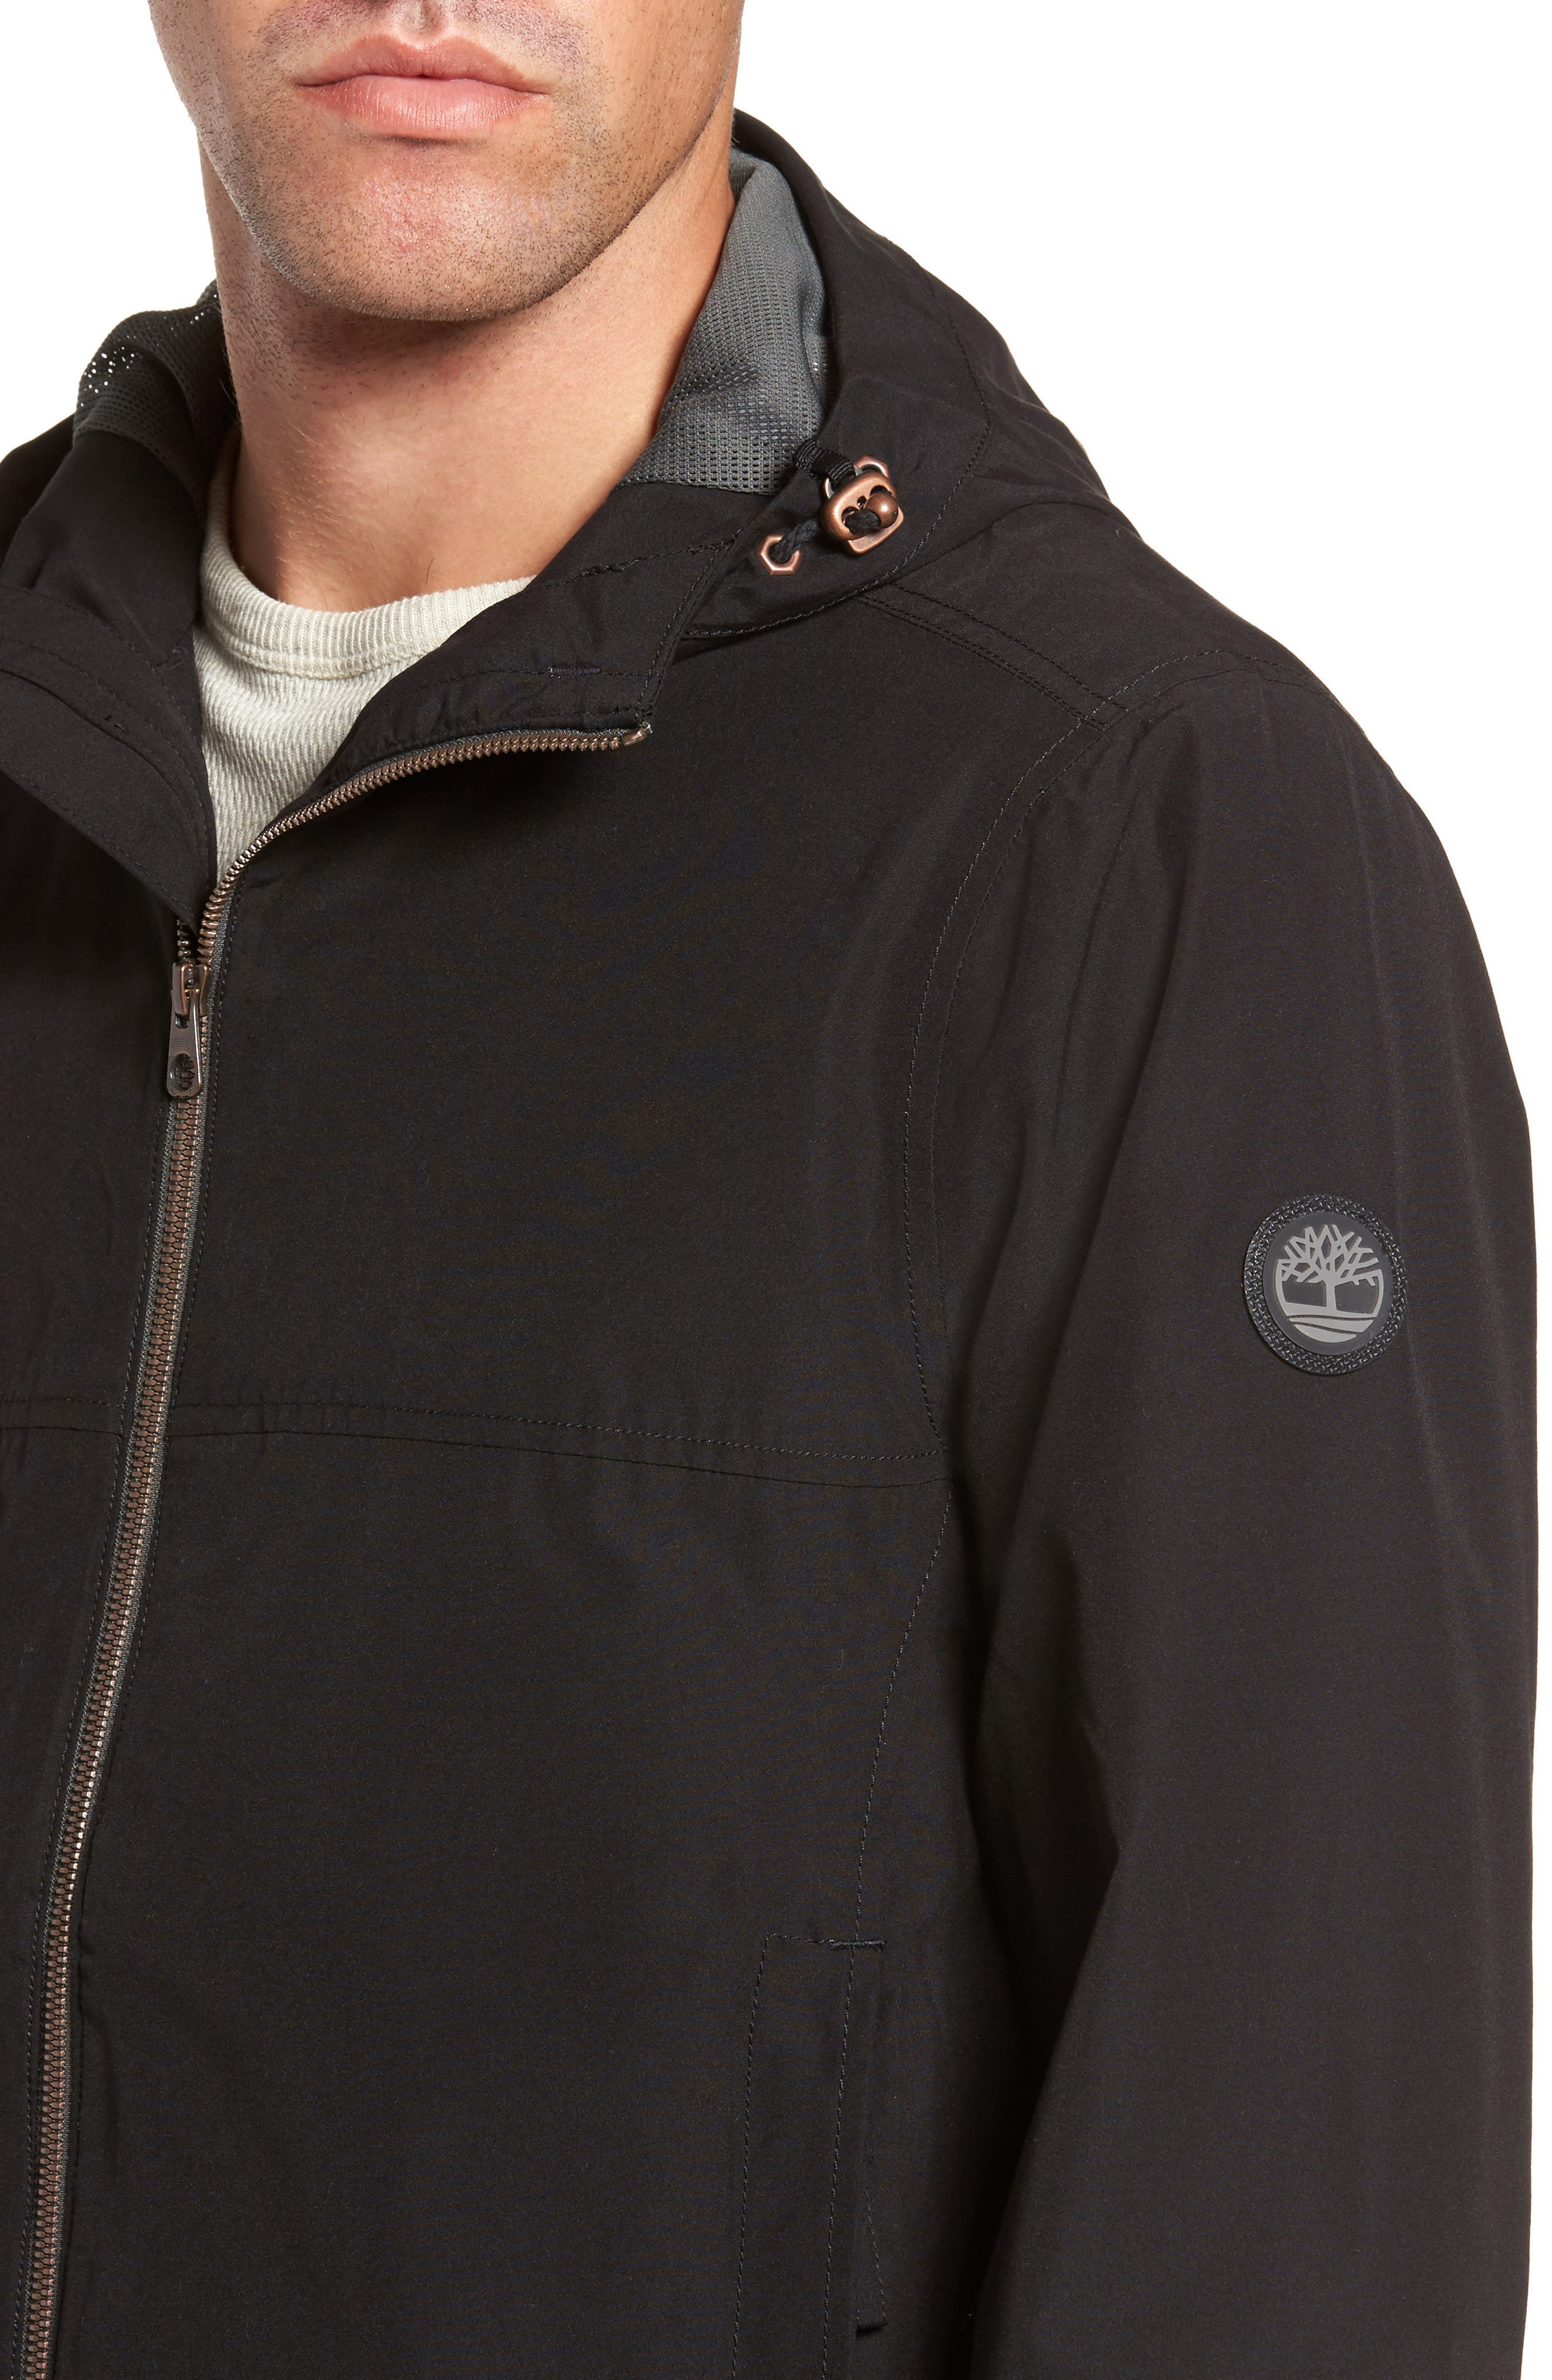 Ragged Mountain Packable Waterproof Jacket,                             Alternate thumbnail 4, color,                             Black